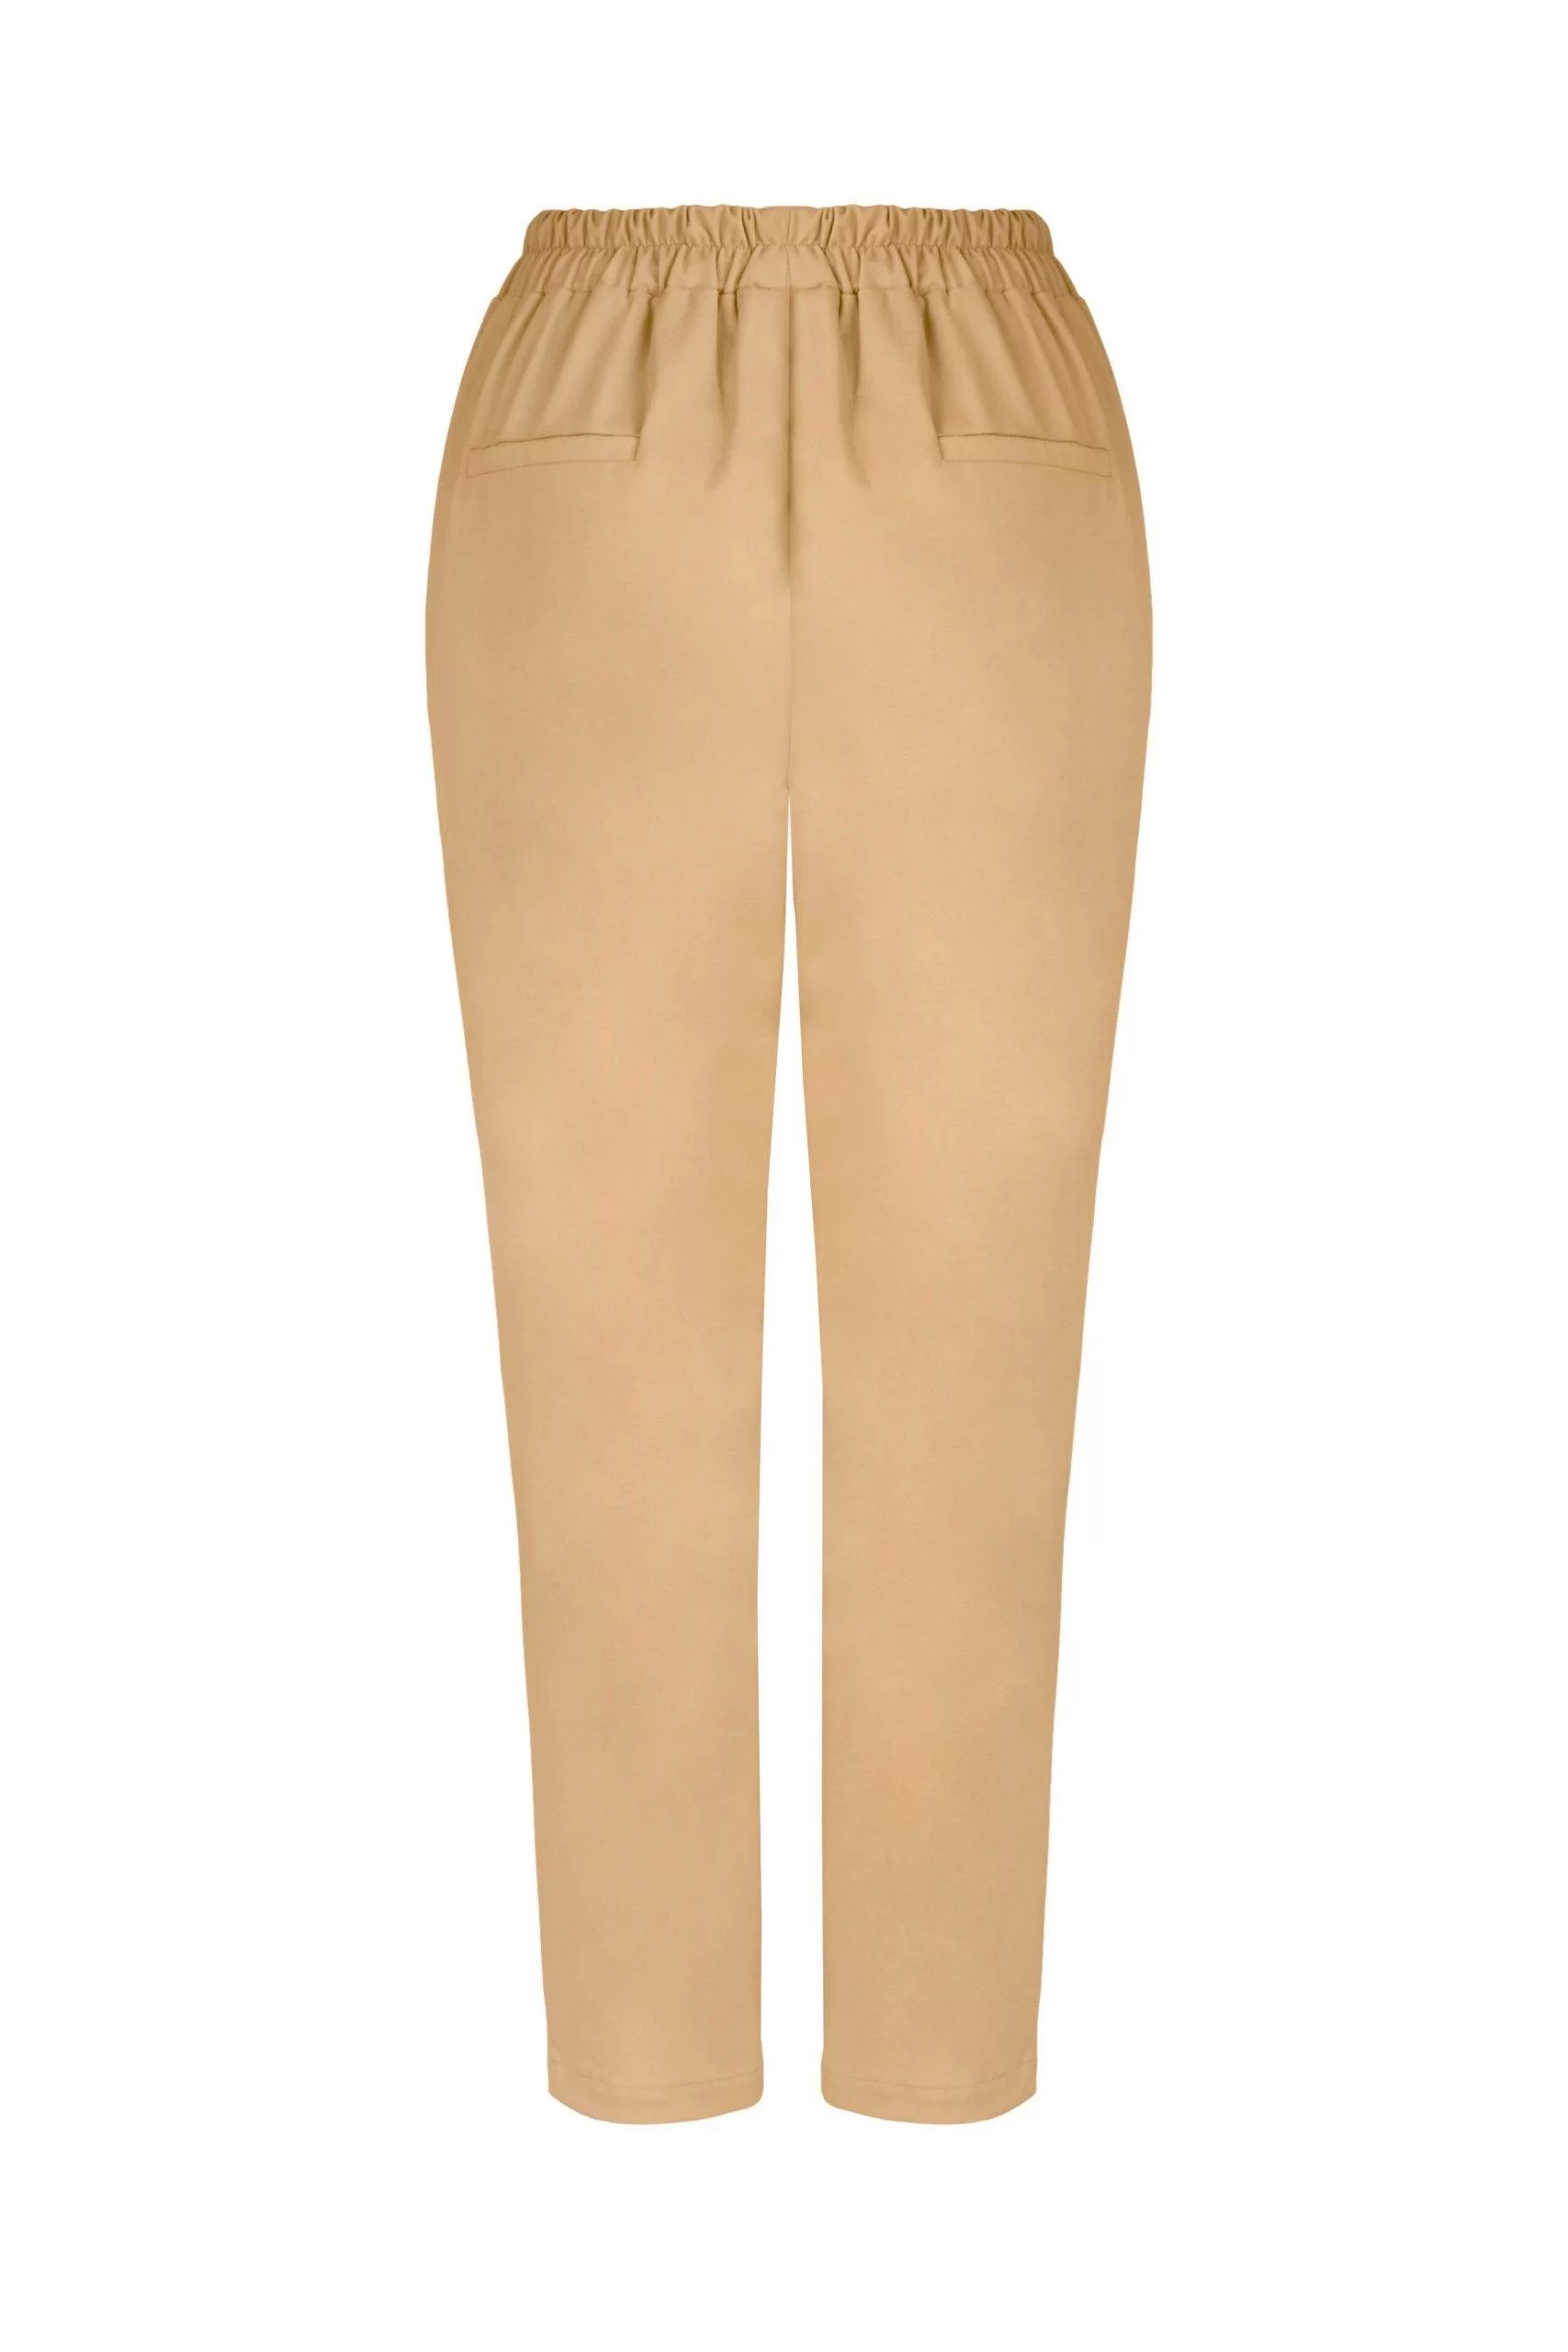 Spodnie Palermo Beżowe